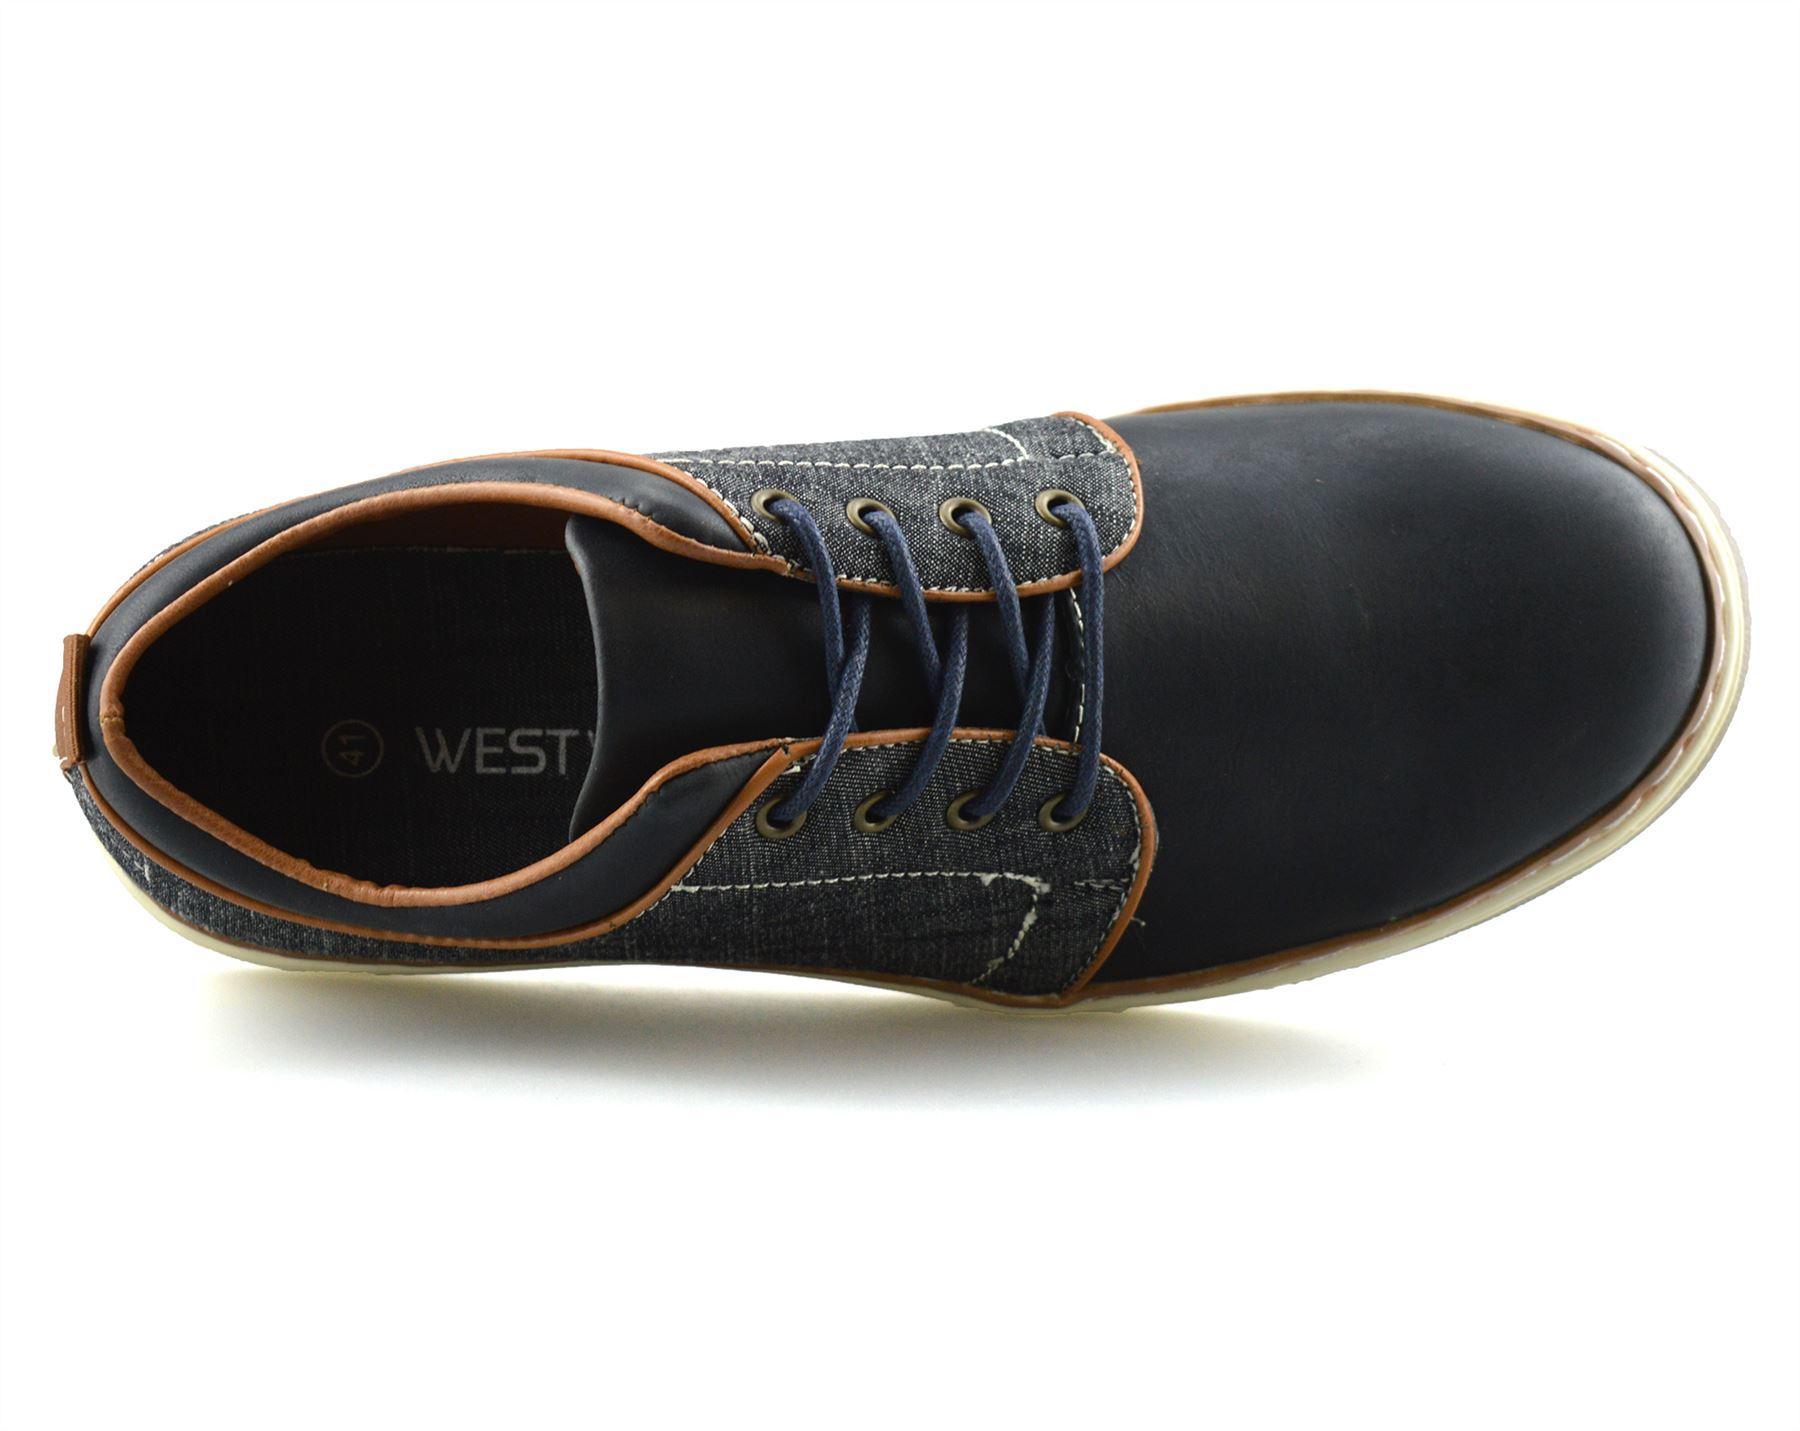 Homme-Nouveau-Casual-Smart-bateau-pont-Mocassin-Walking-Driving-Work-Lace-Up-Chaussures-Taille miniature 16